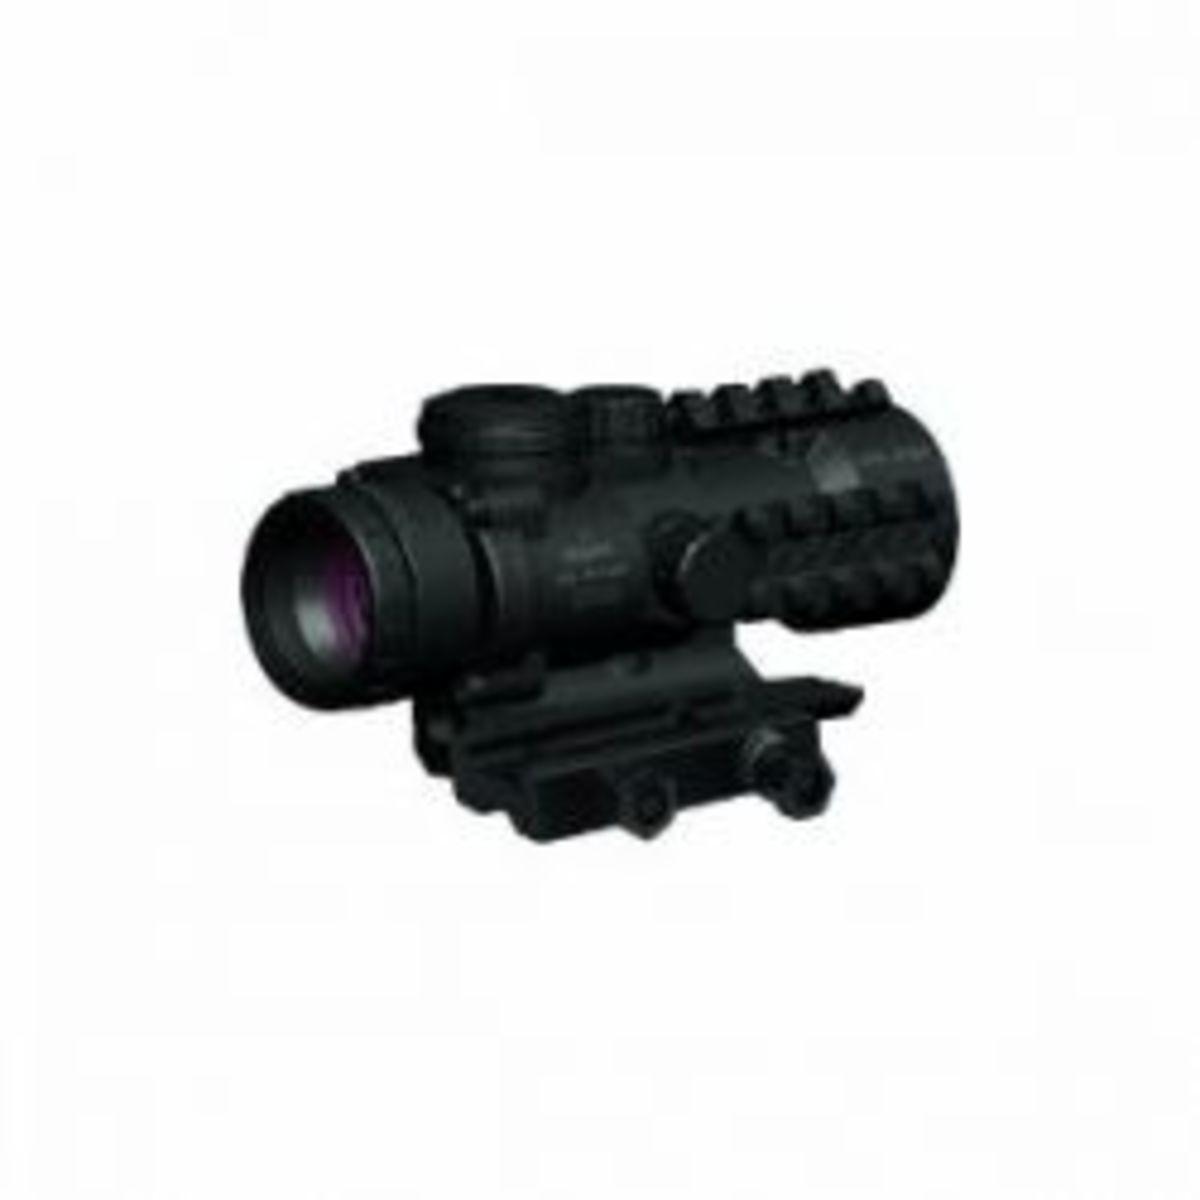 Best AR 15 scope under $500